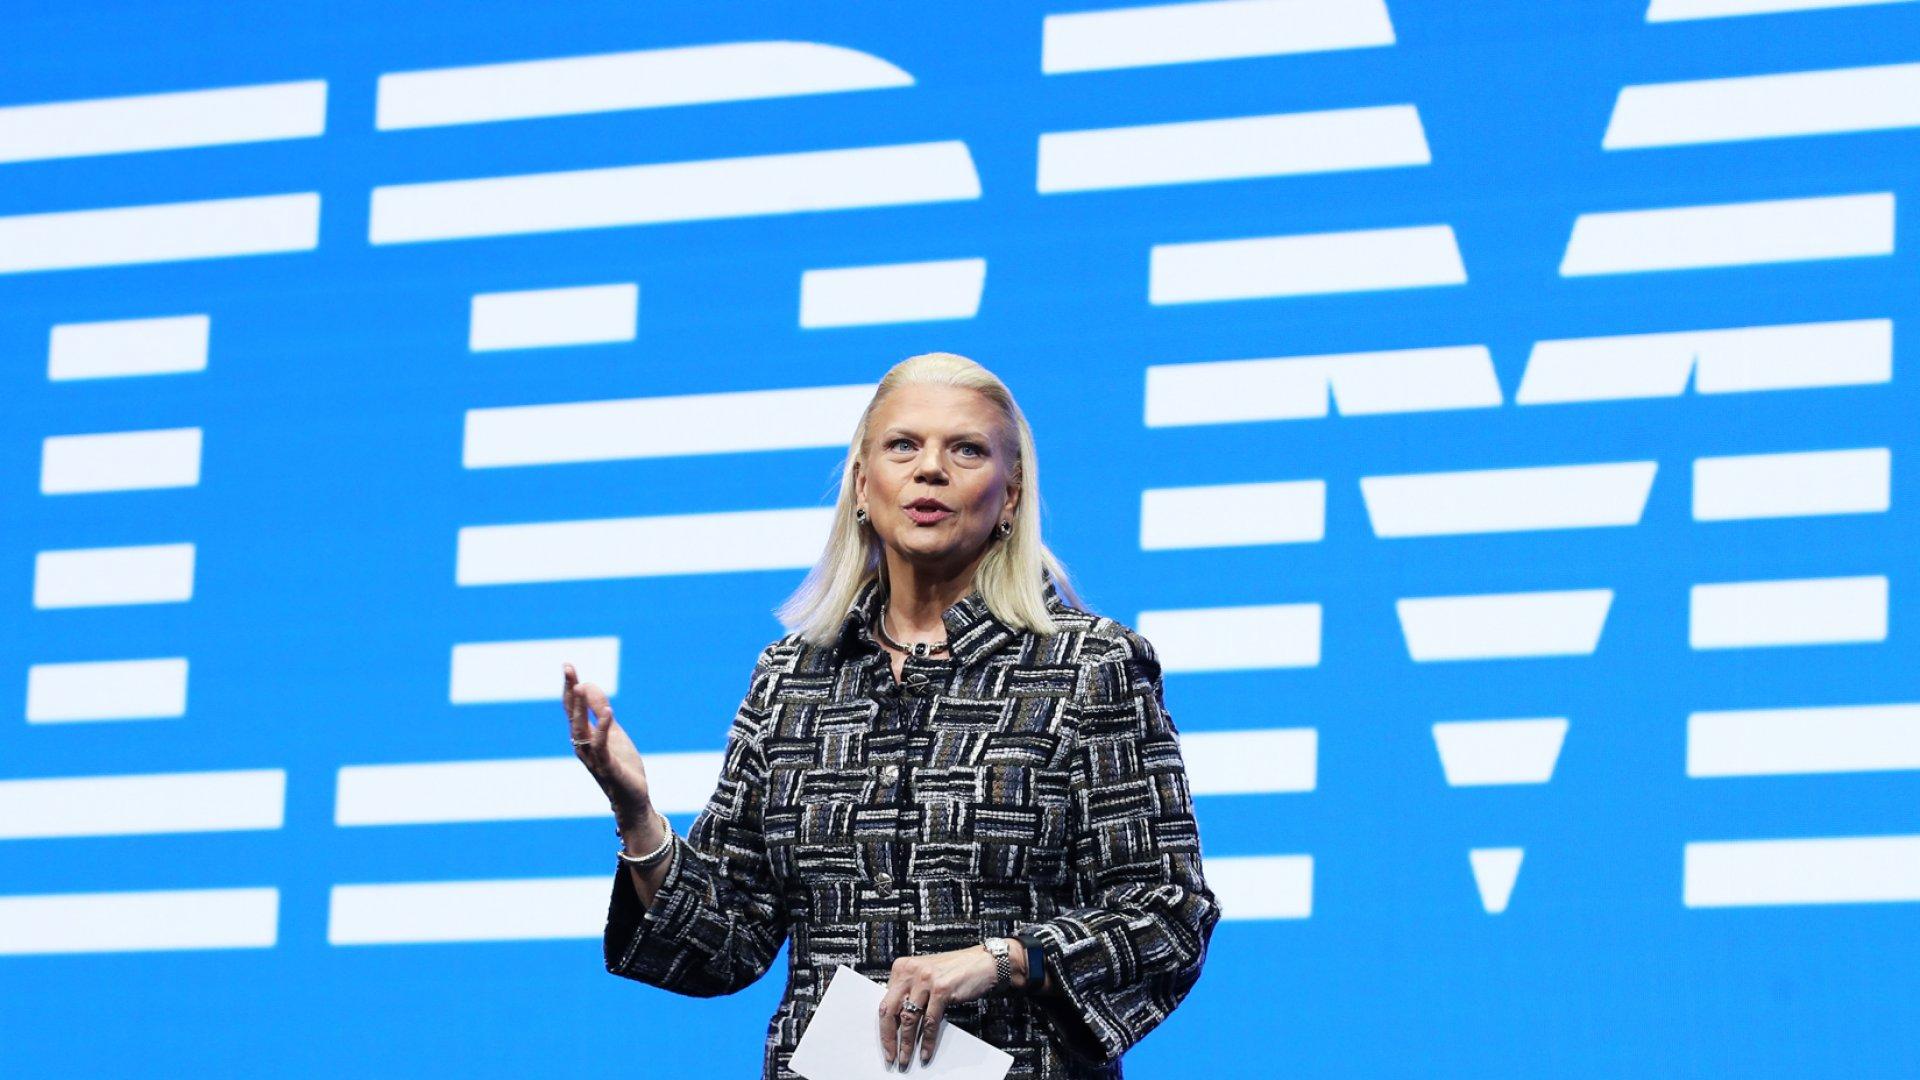 IBM Chairman, President and CEO Ginni Rometty.